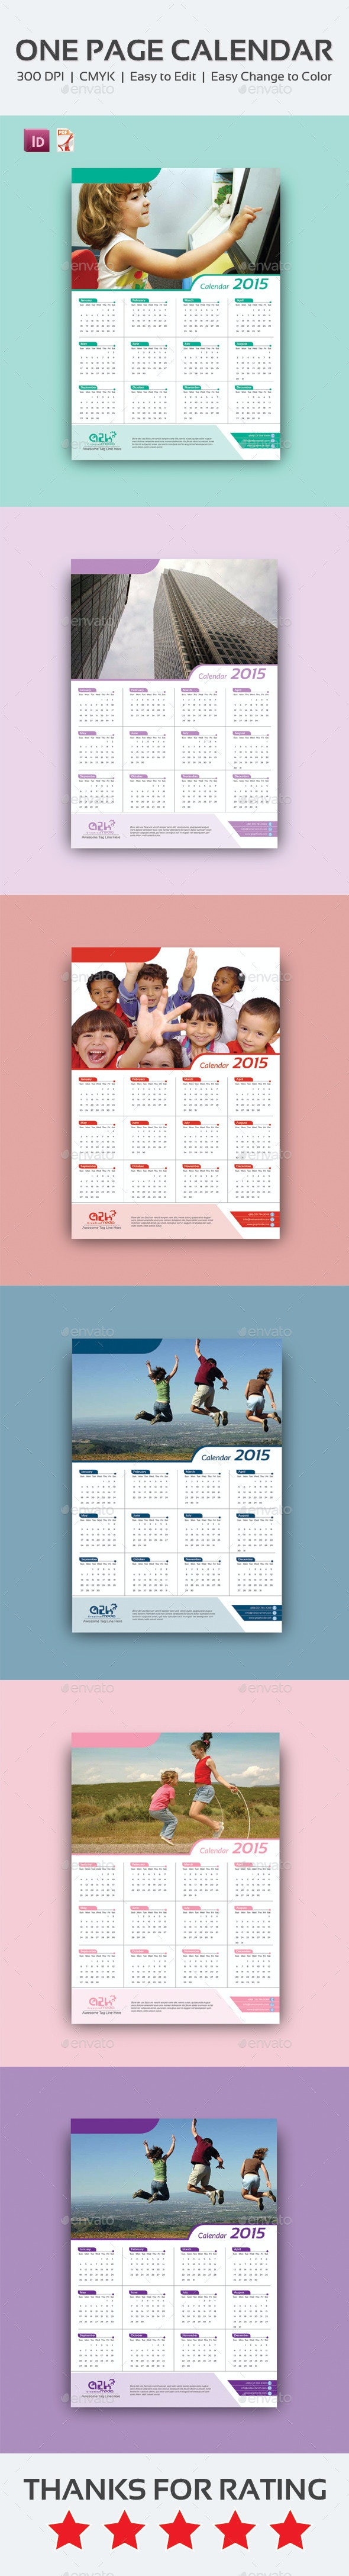 One Page Calendar Design  - Calendars Stationery